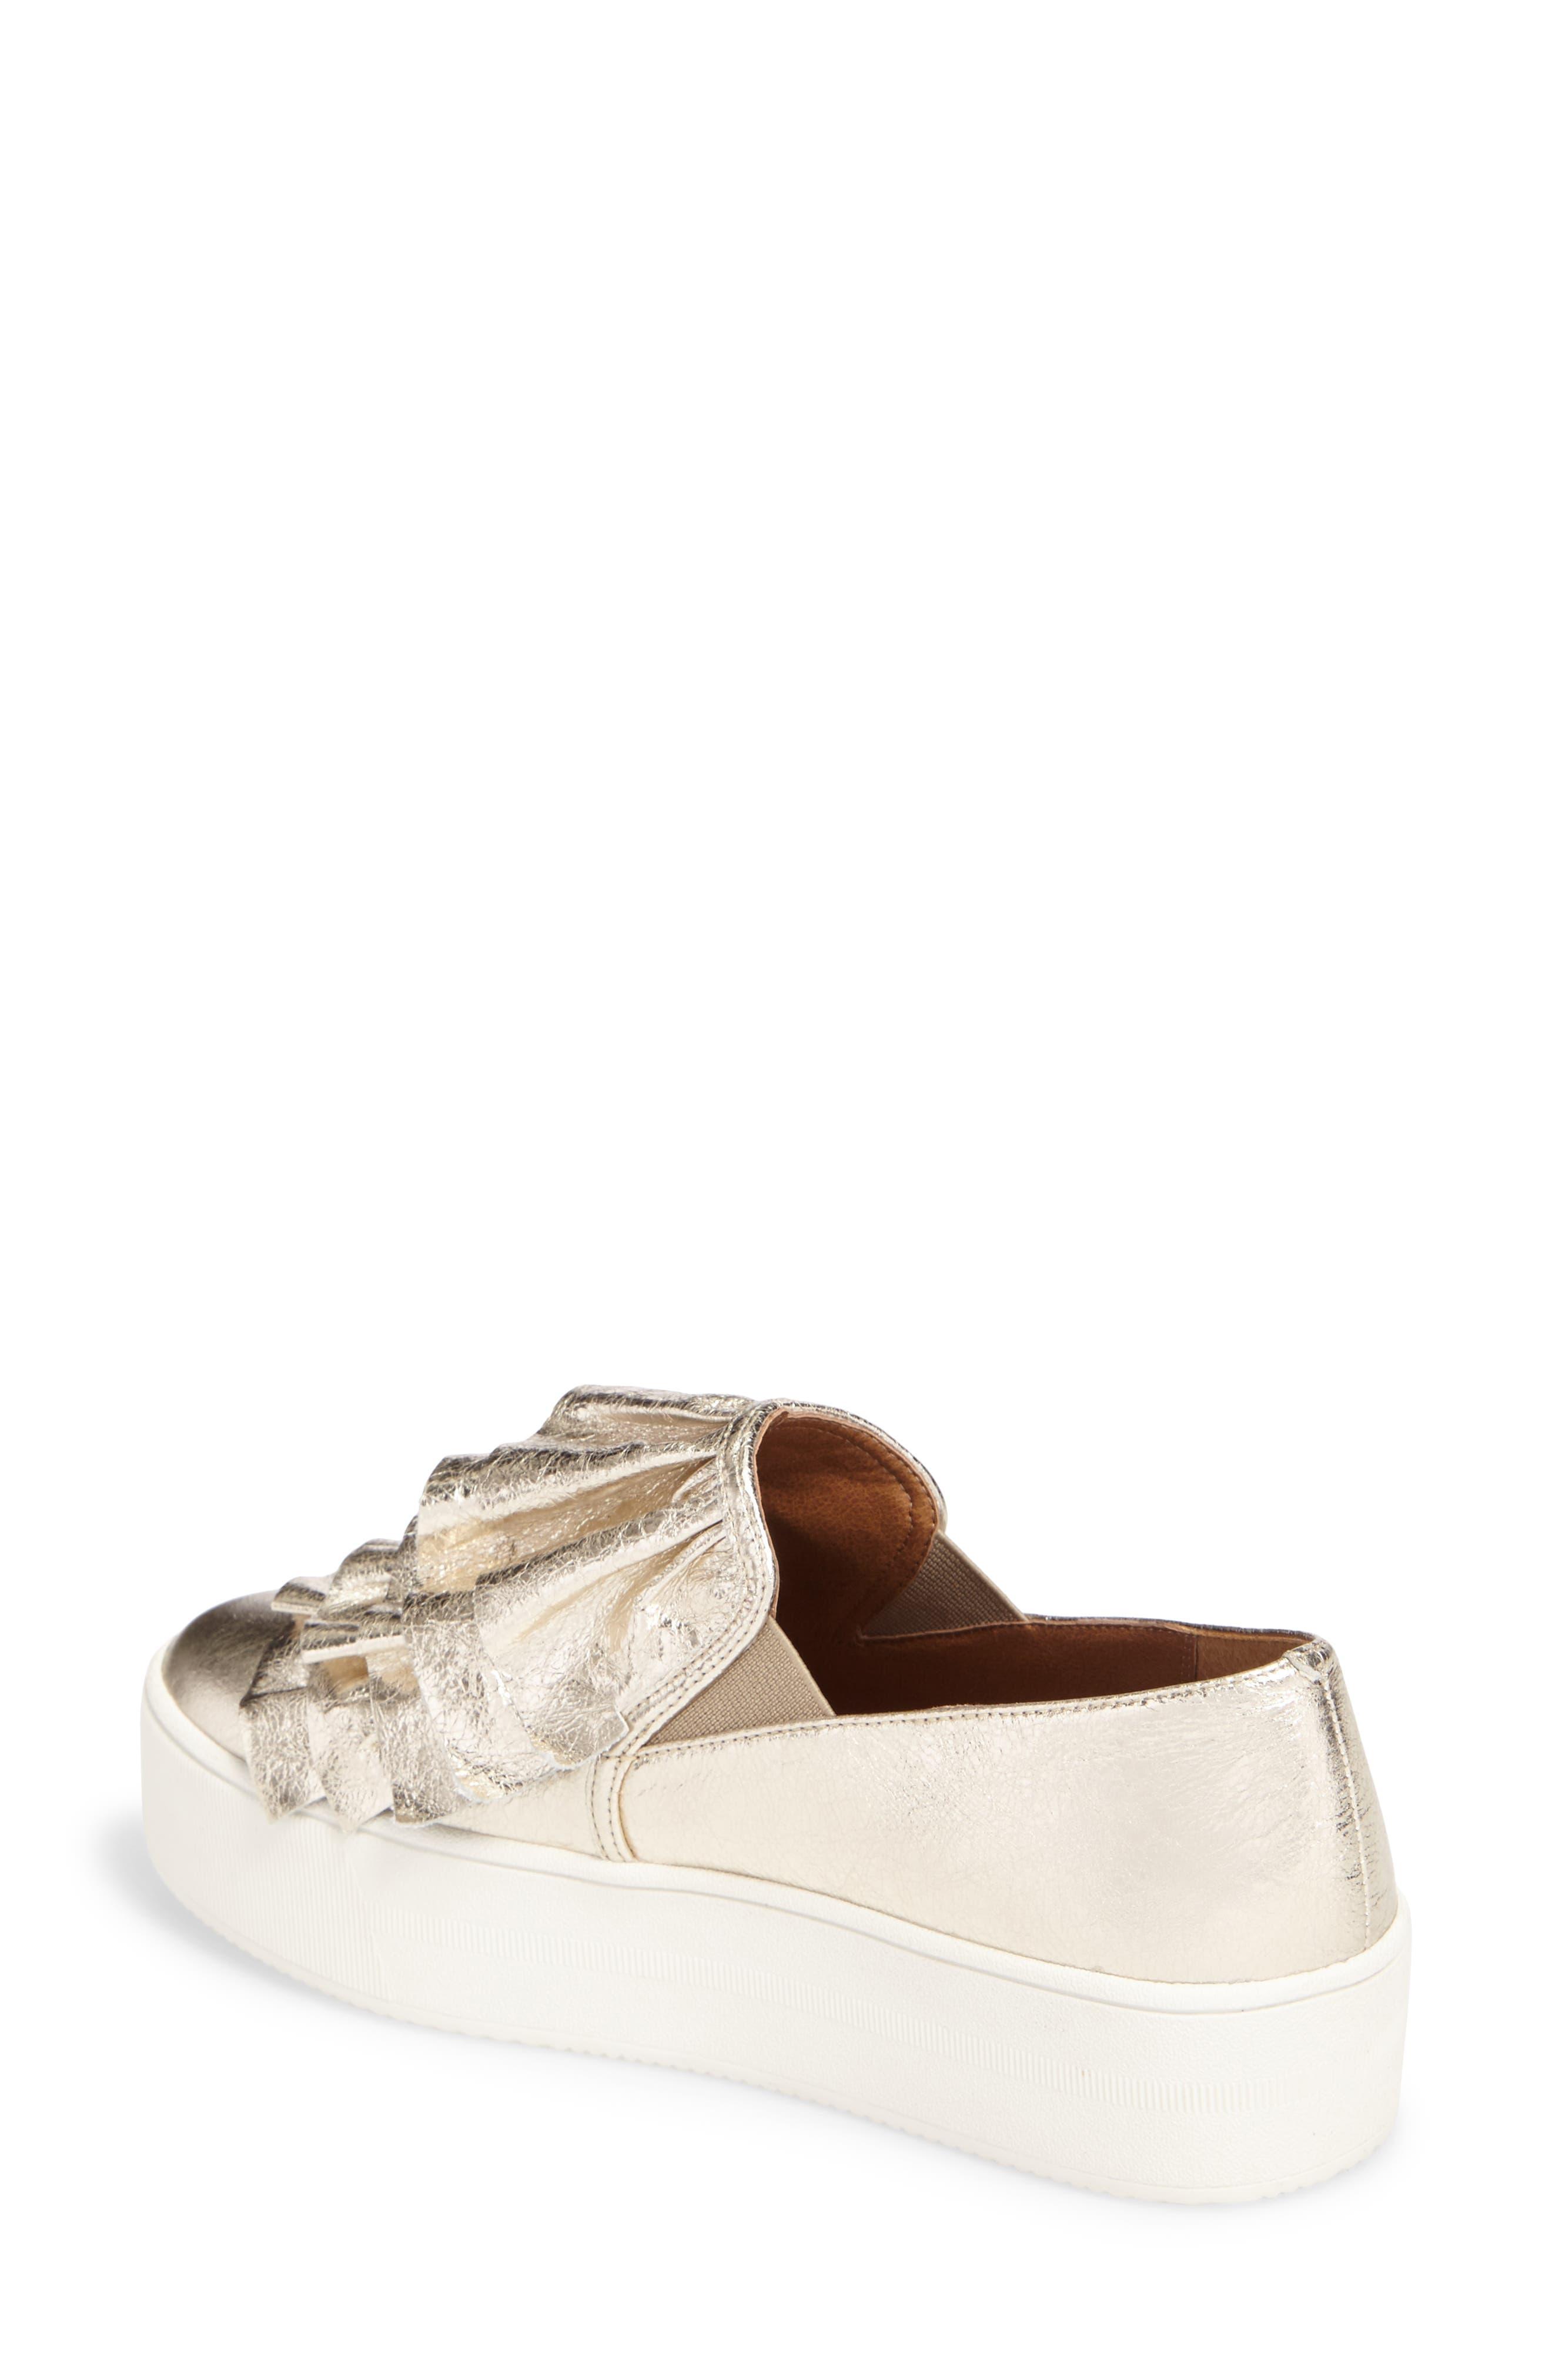 Marian Platform Sneaker,                             Alternate thumbnail 2, color,                             Gold Leather